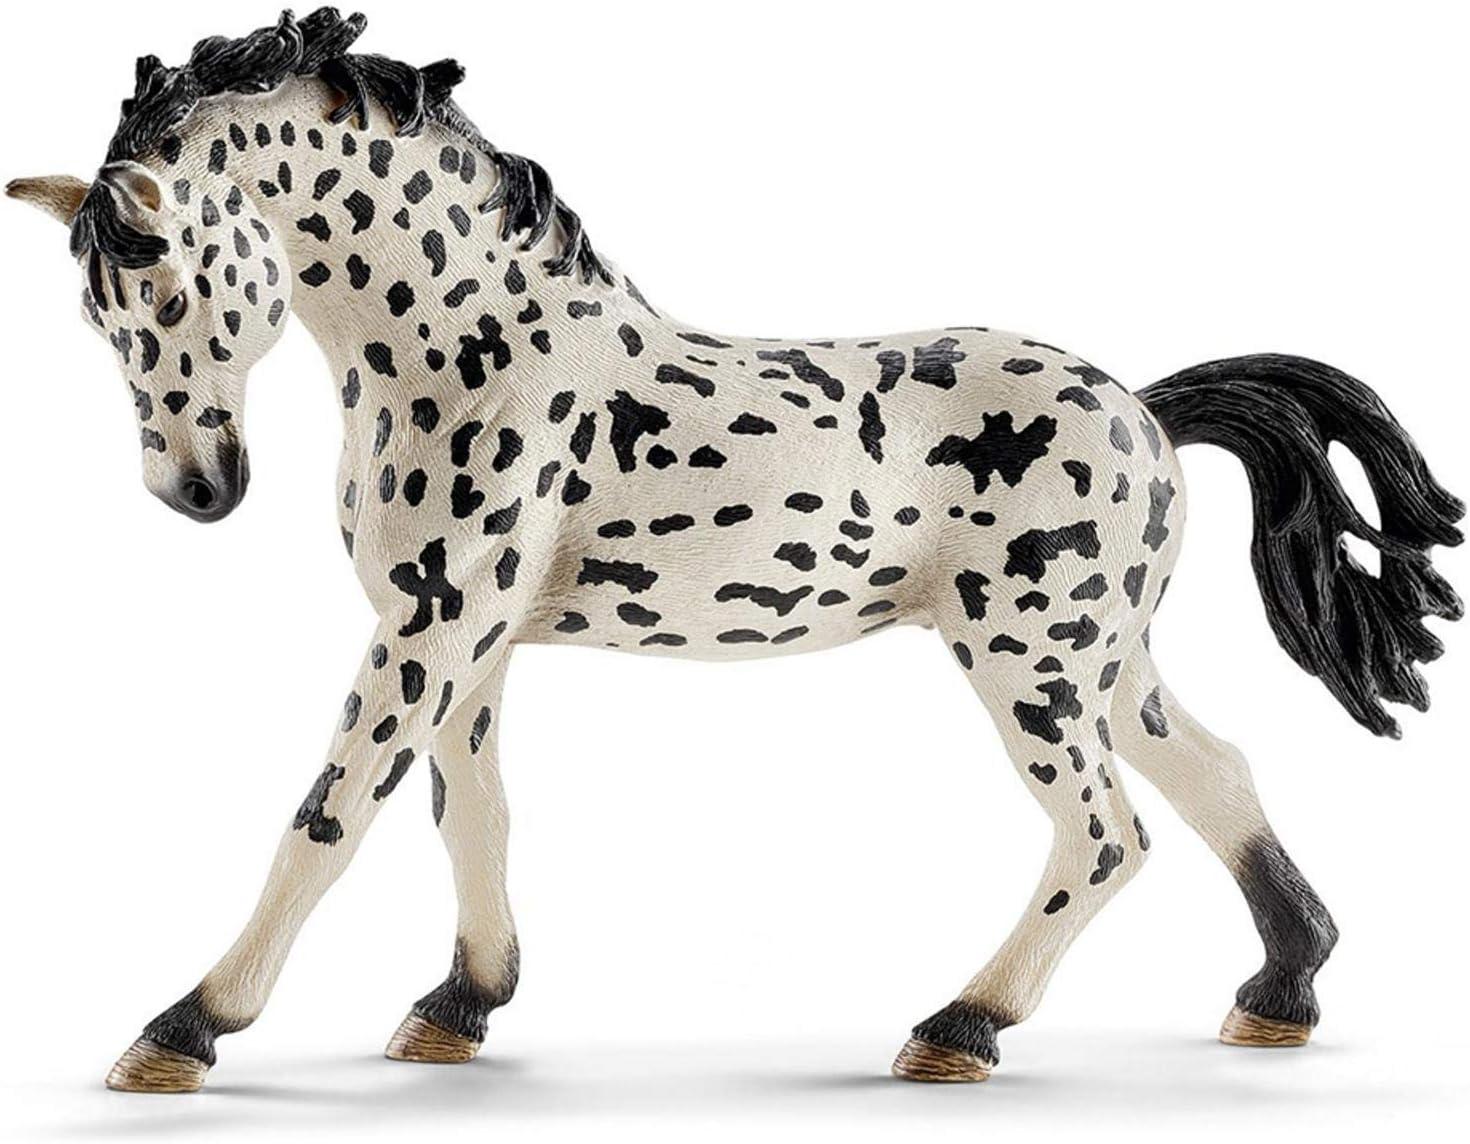 SHUAN Great interest Horse Landscape Decoration Realistic Ranking TOP2 Po Plastic Ornaments